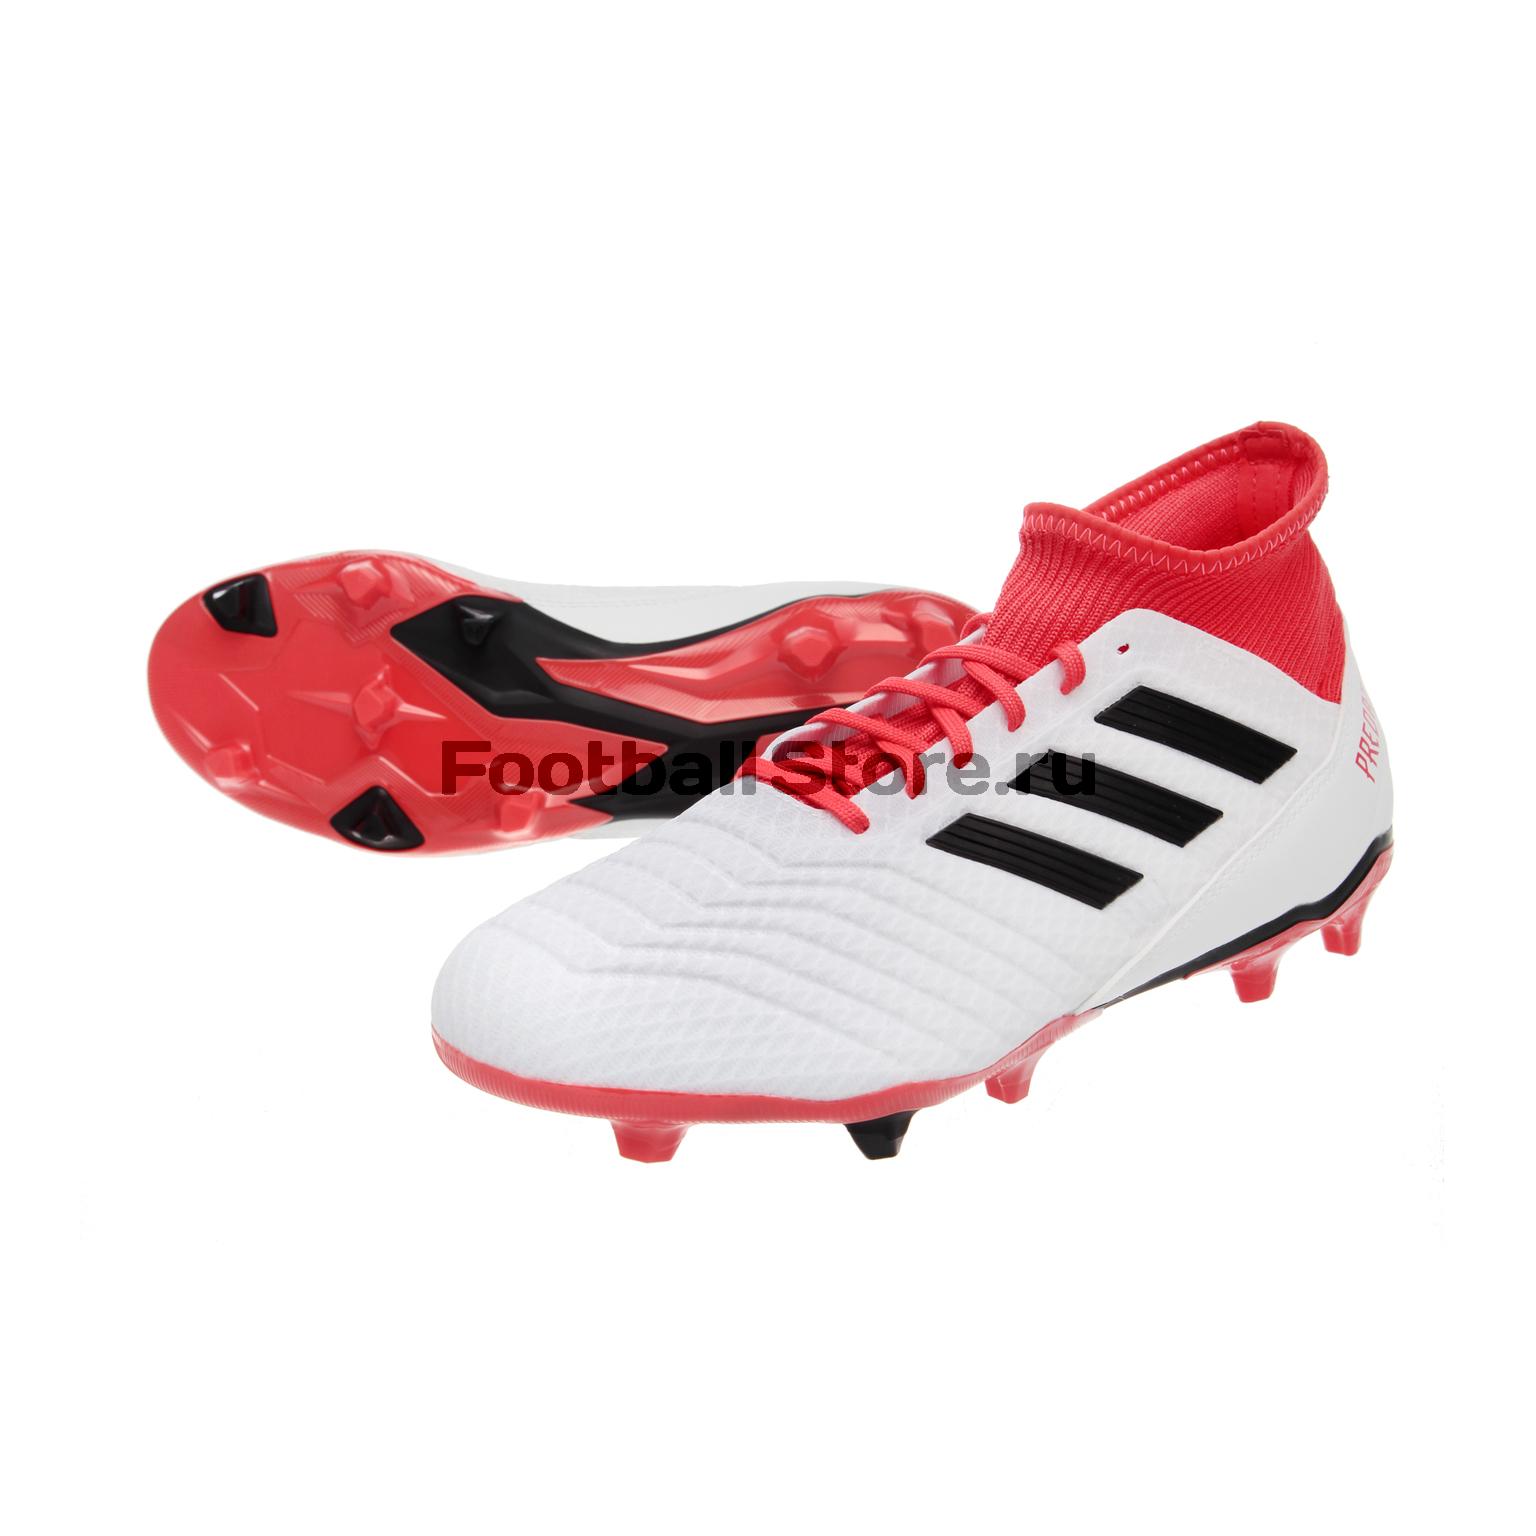 Бутсы Adidas Predator 18.3 FG CM7667 adidas predator junior gk glove